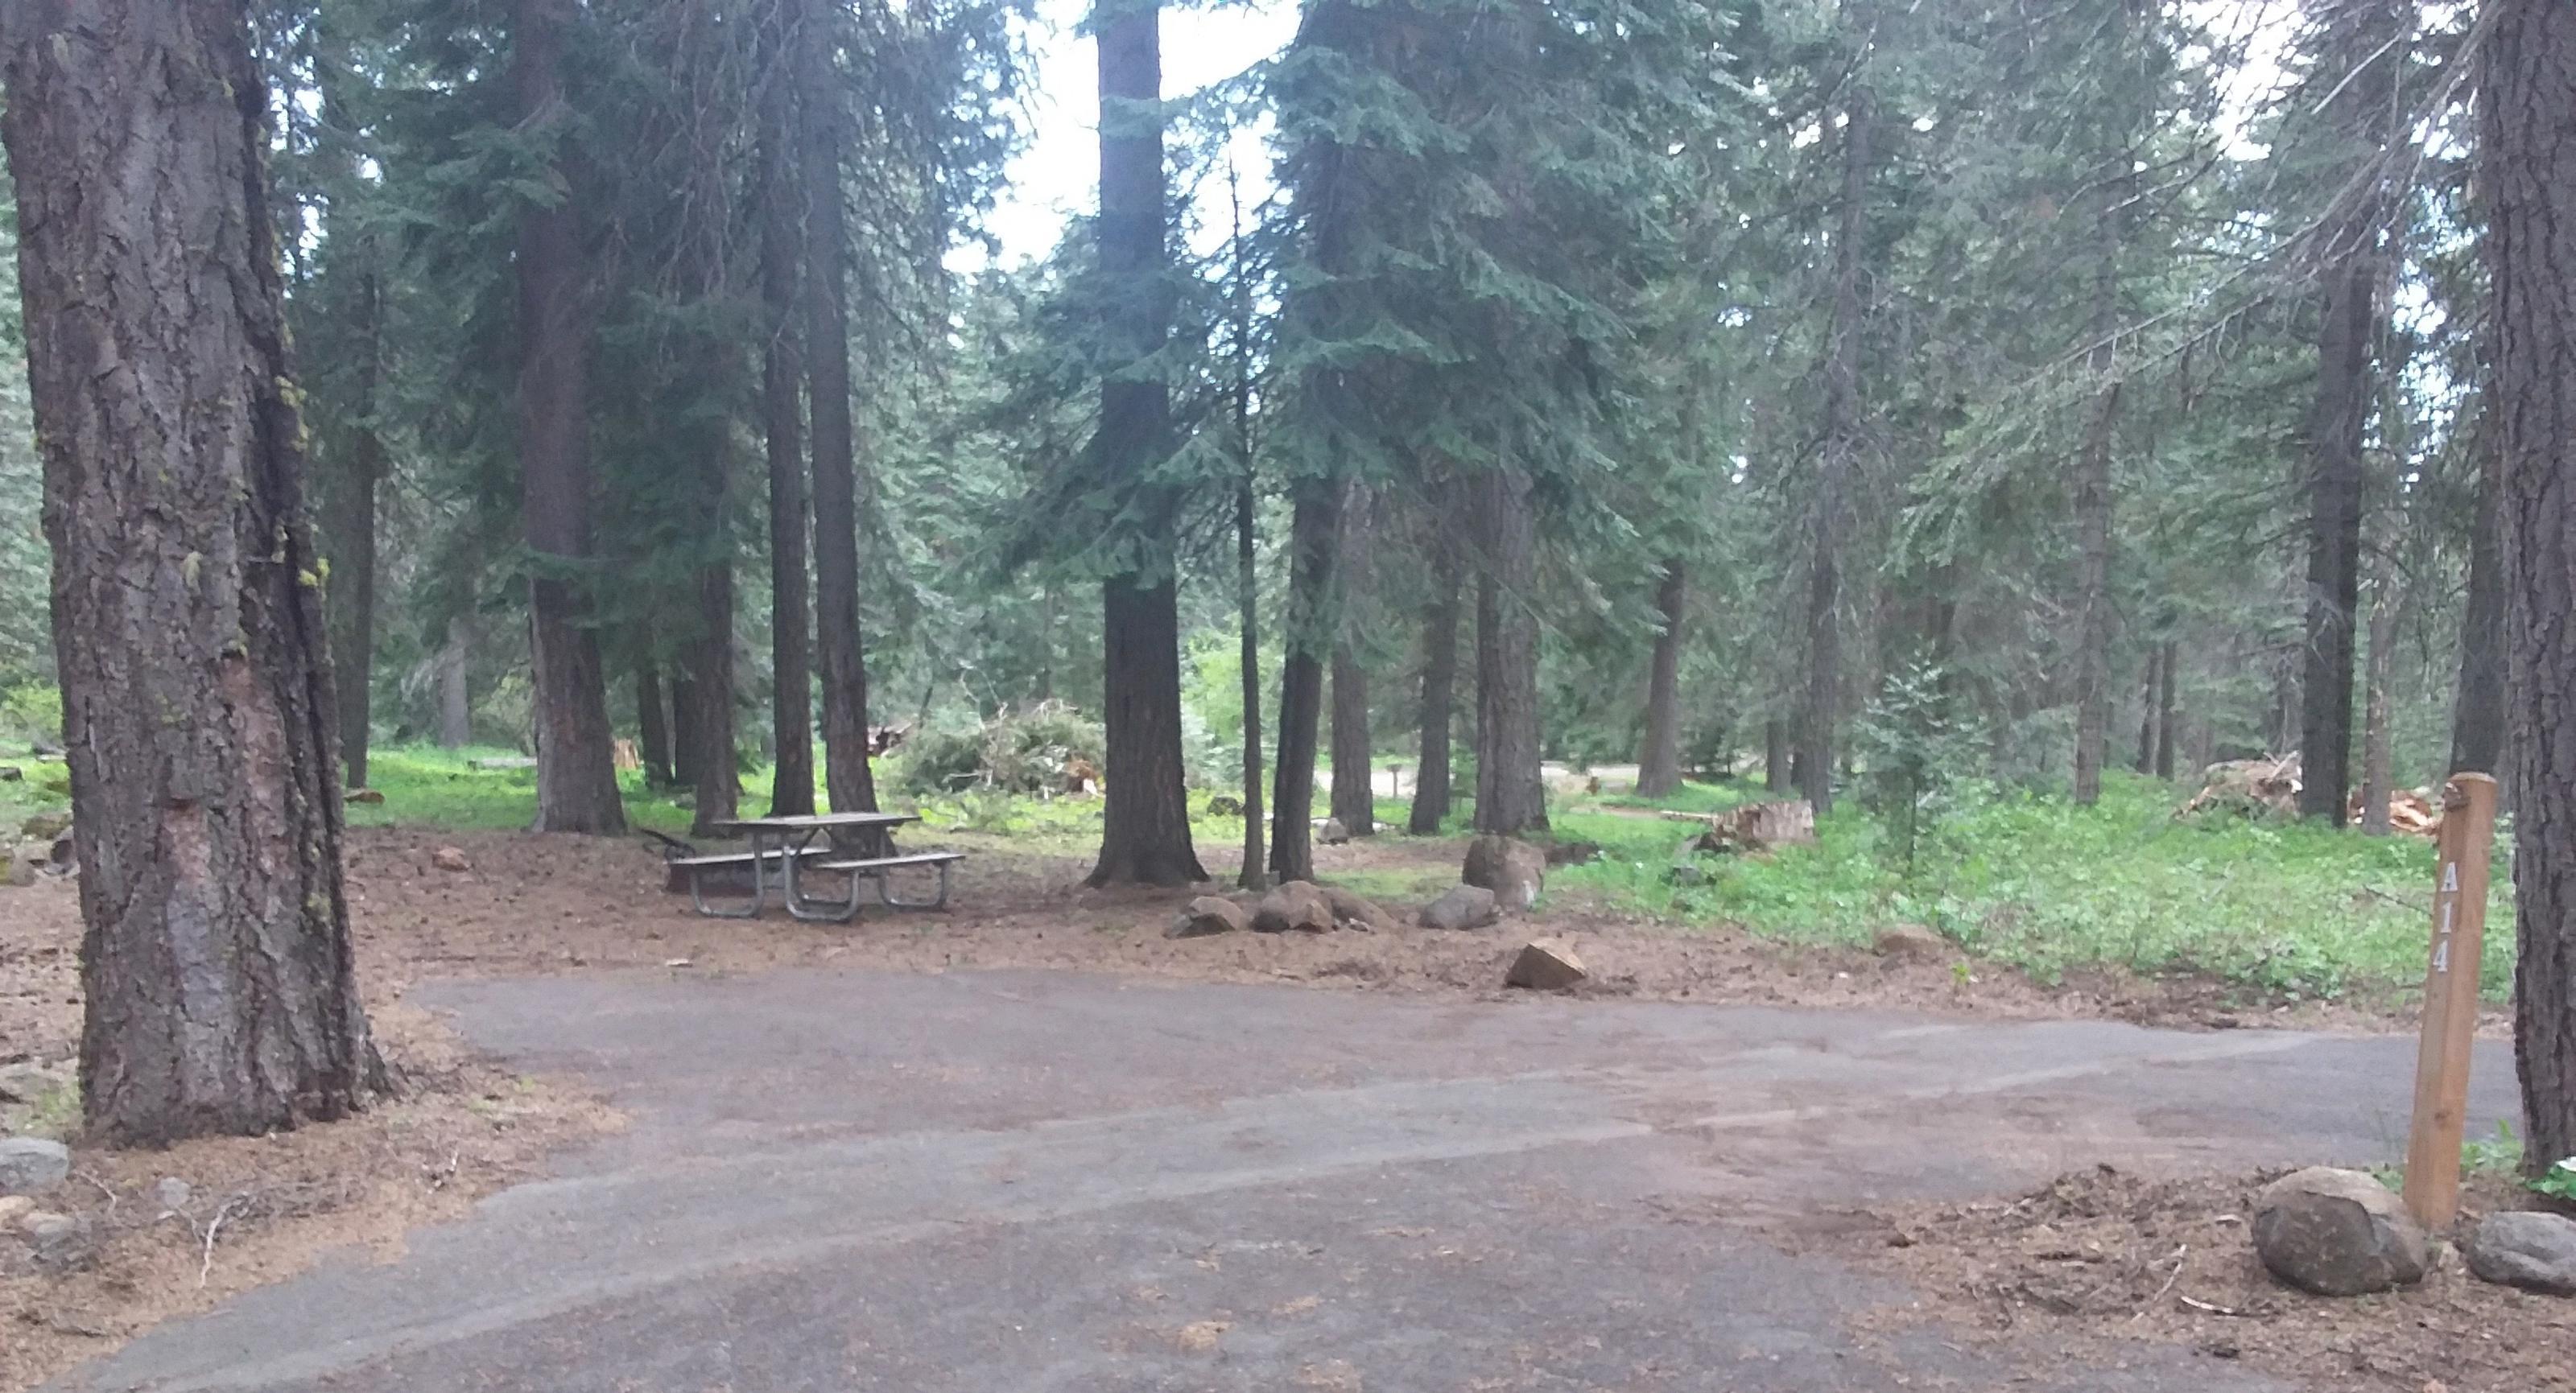 Campsite A14- Hyatt LakeCampsite 14, Loop A Hyatt Lake